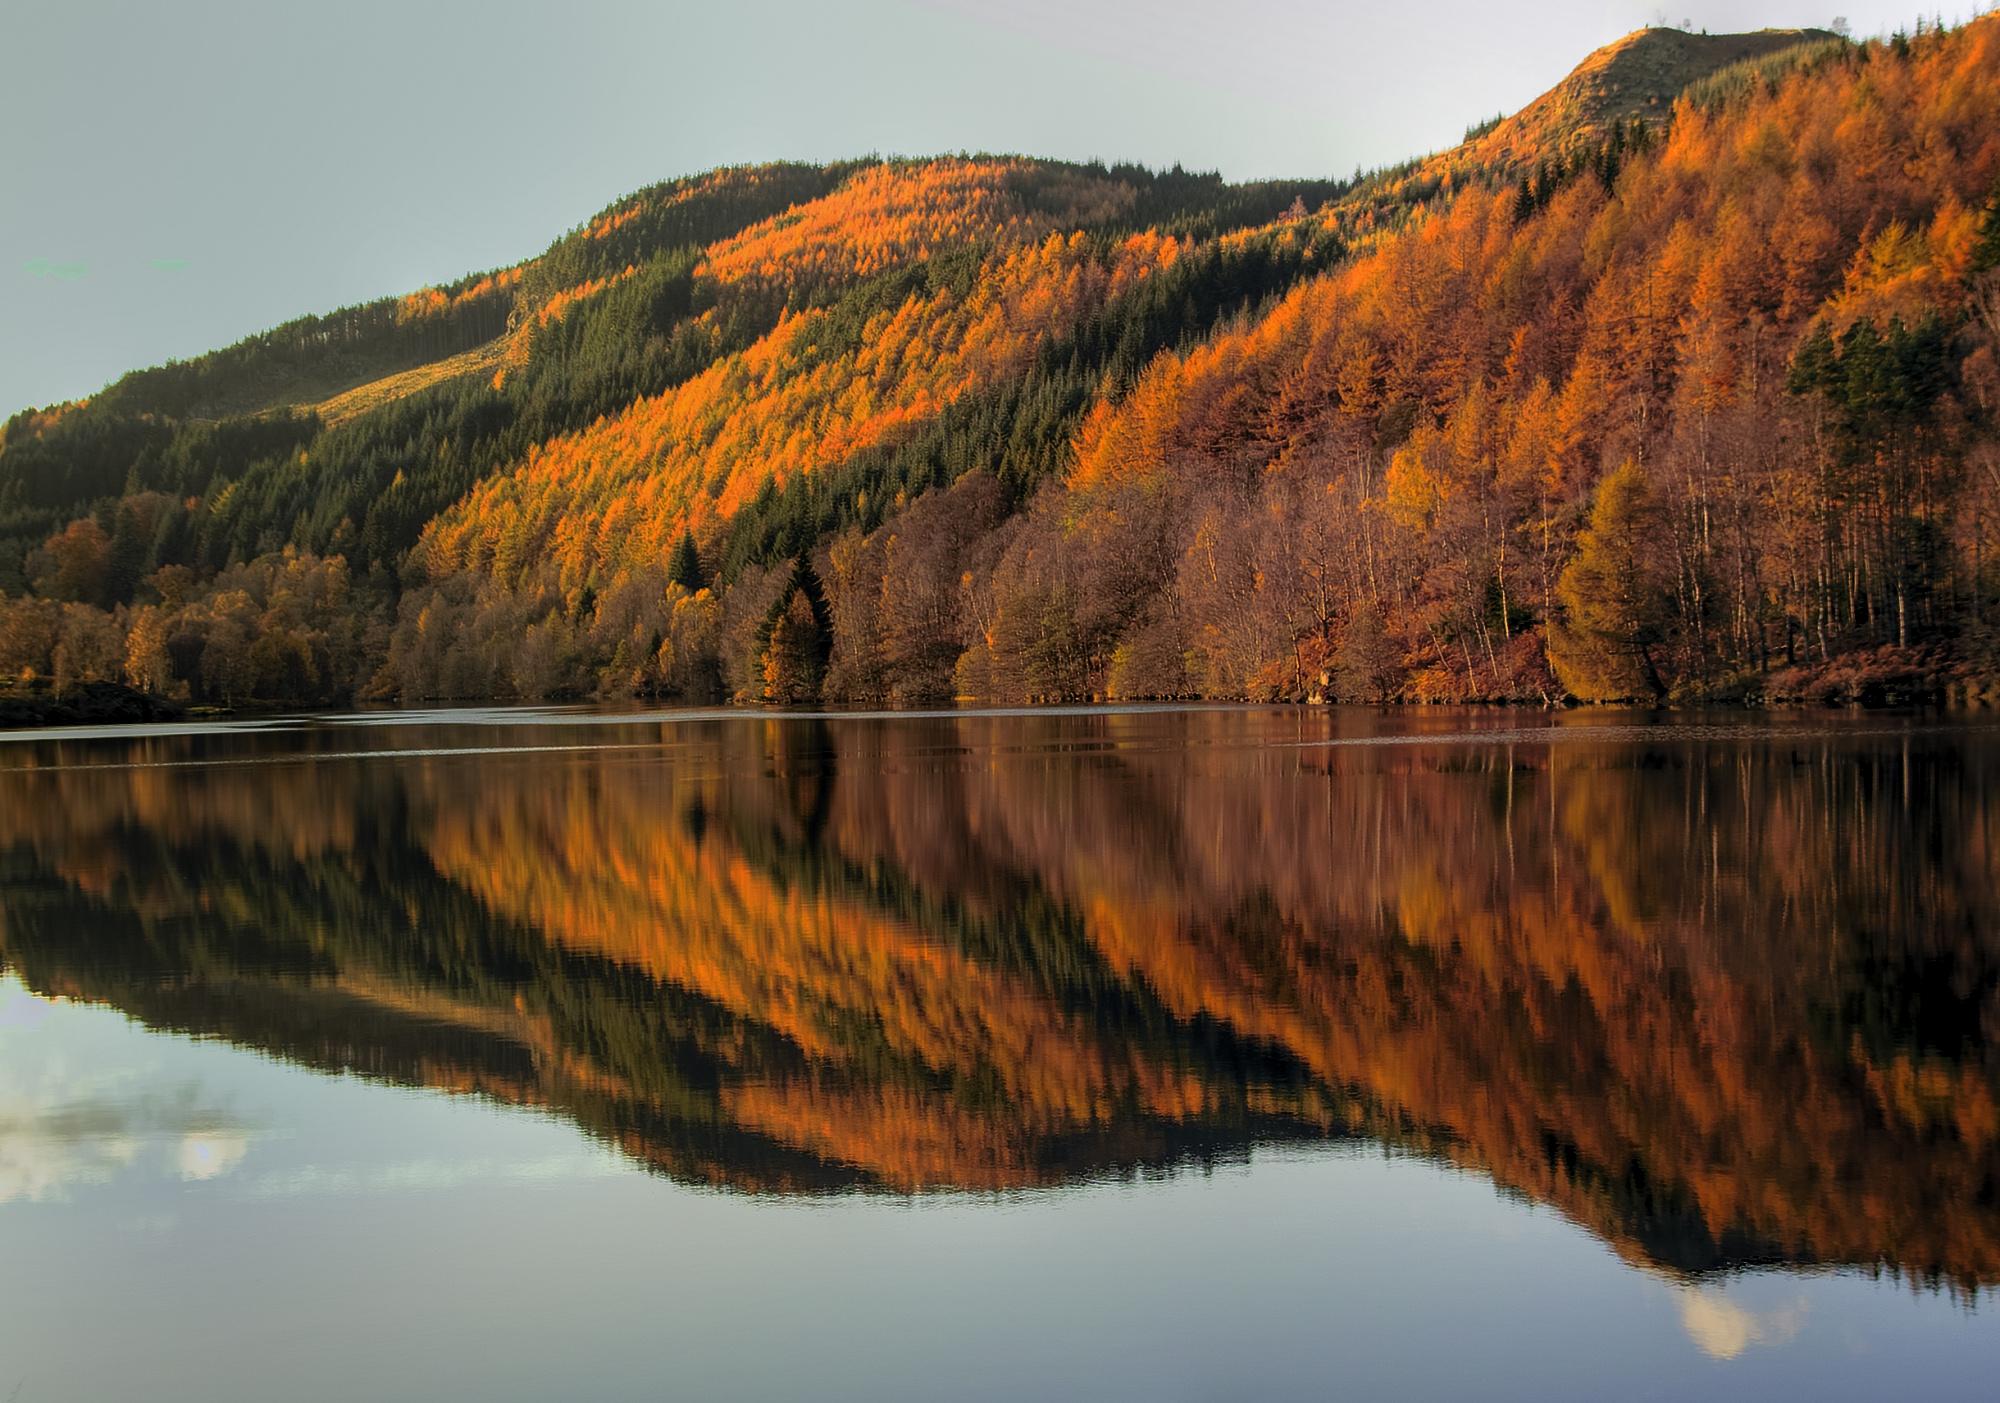 Loch Faskaly Reflection